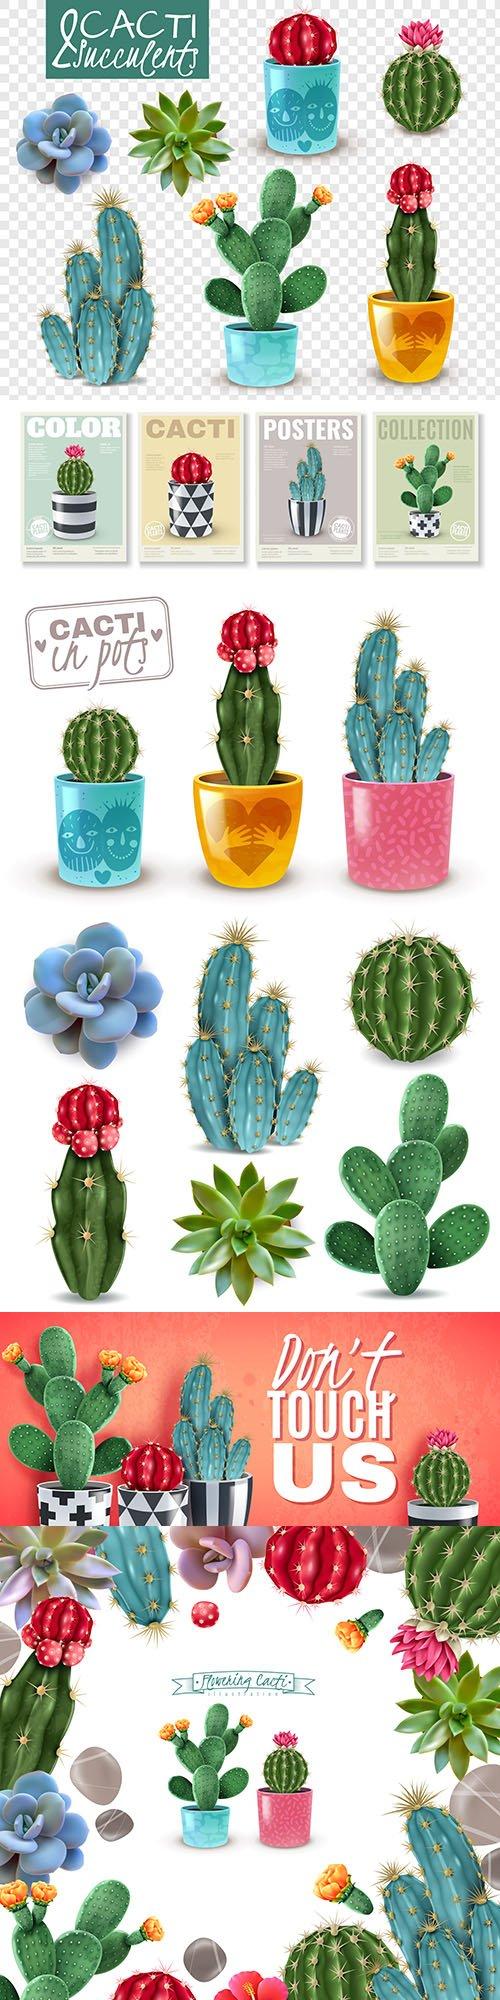 Flowering cactus room plants realistic illustrations